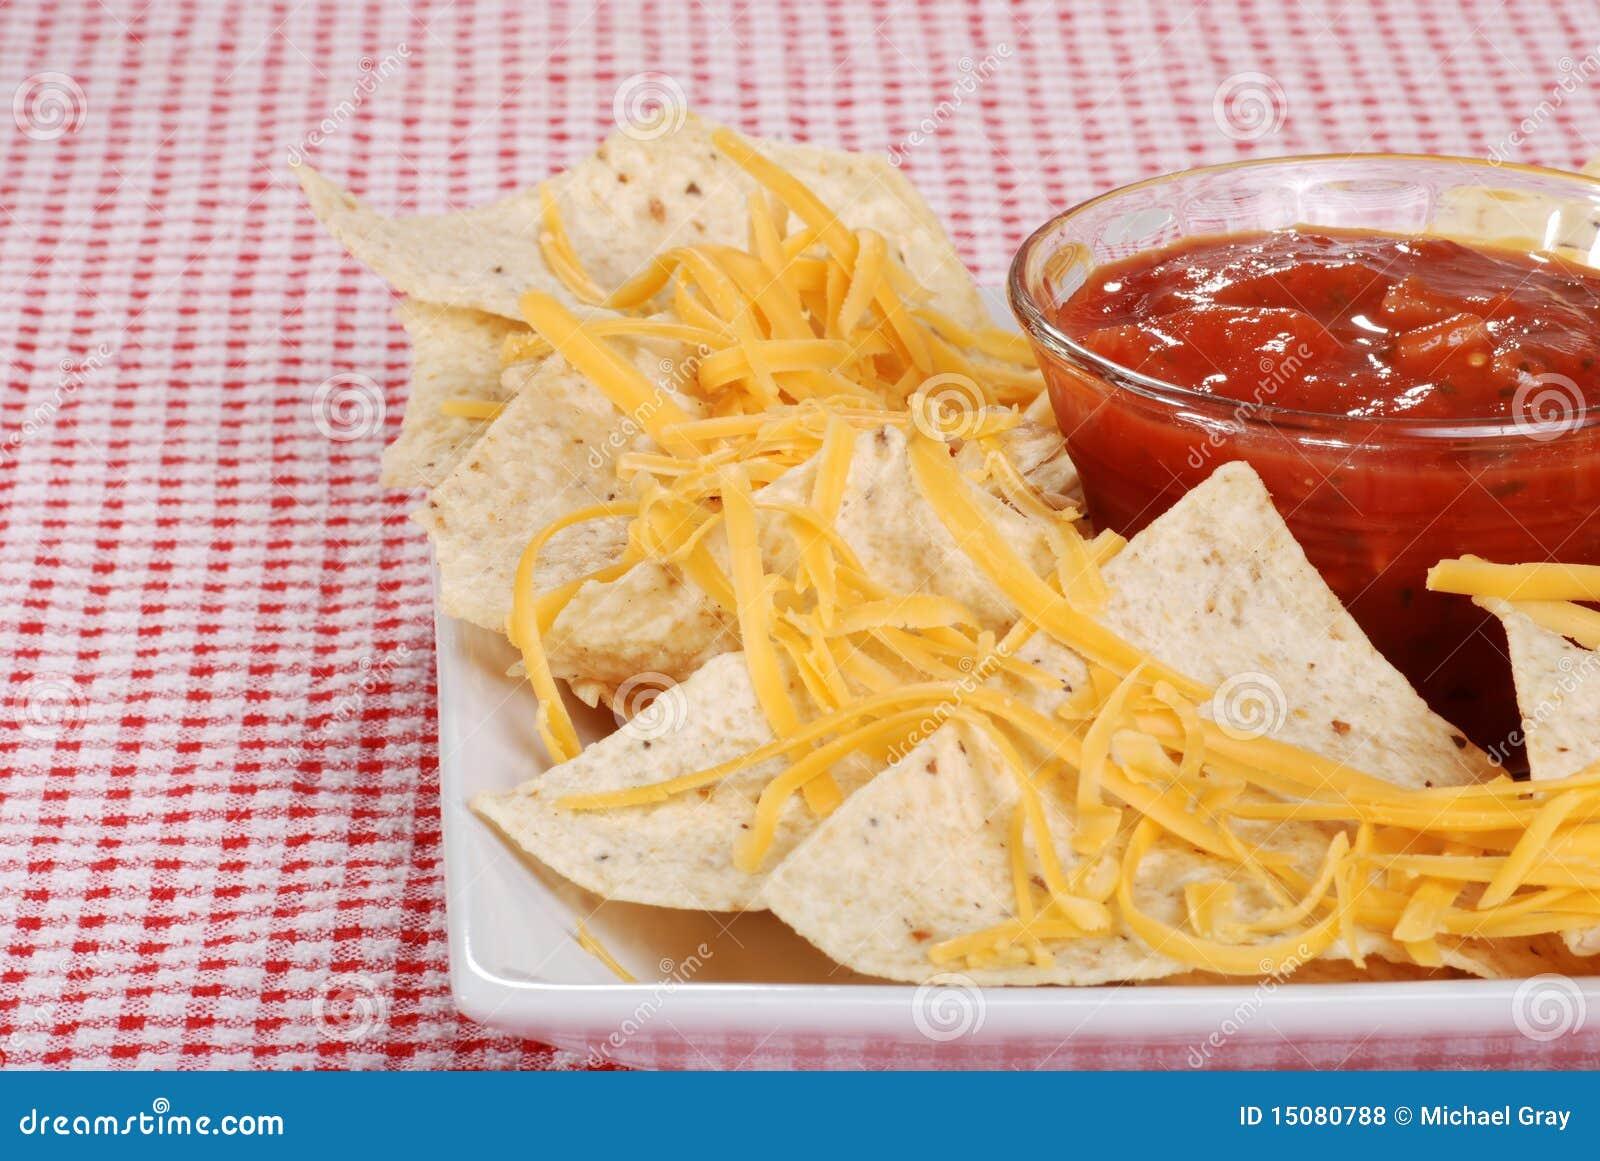 closeup nachos and cheese focus on salsa royalty free Nachos Clip Art Black and White Nachos Clip Art Black and White